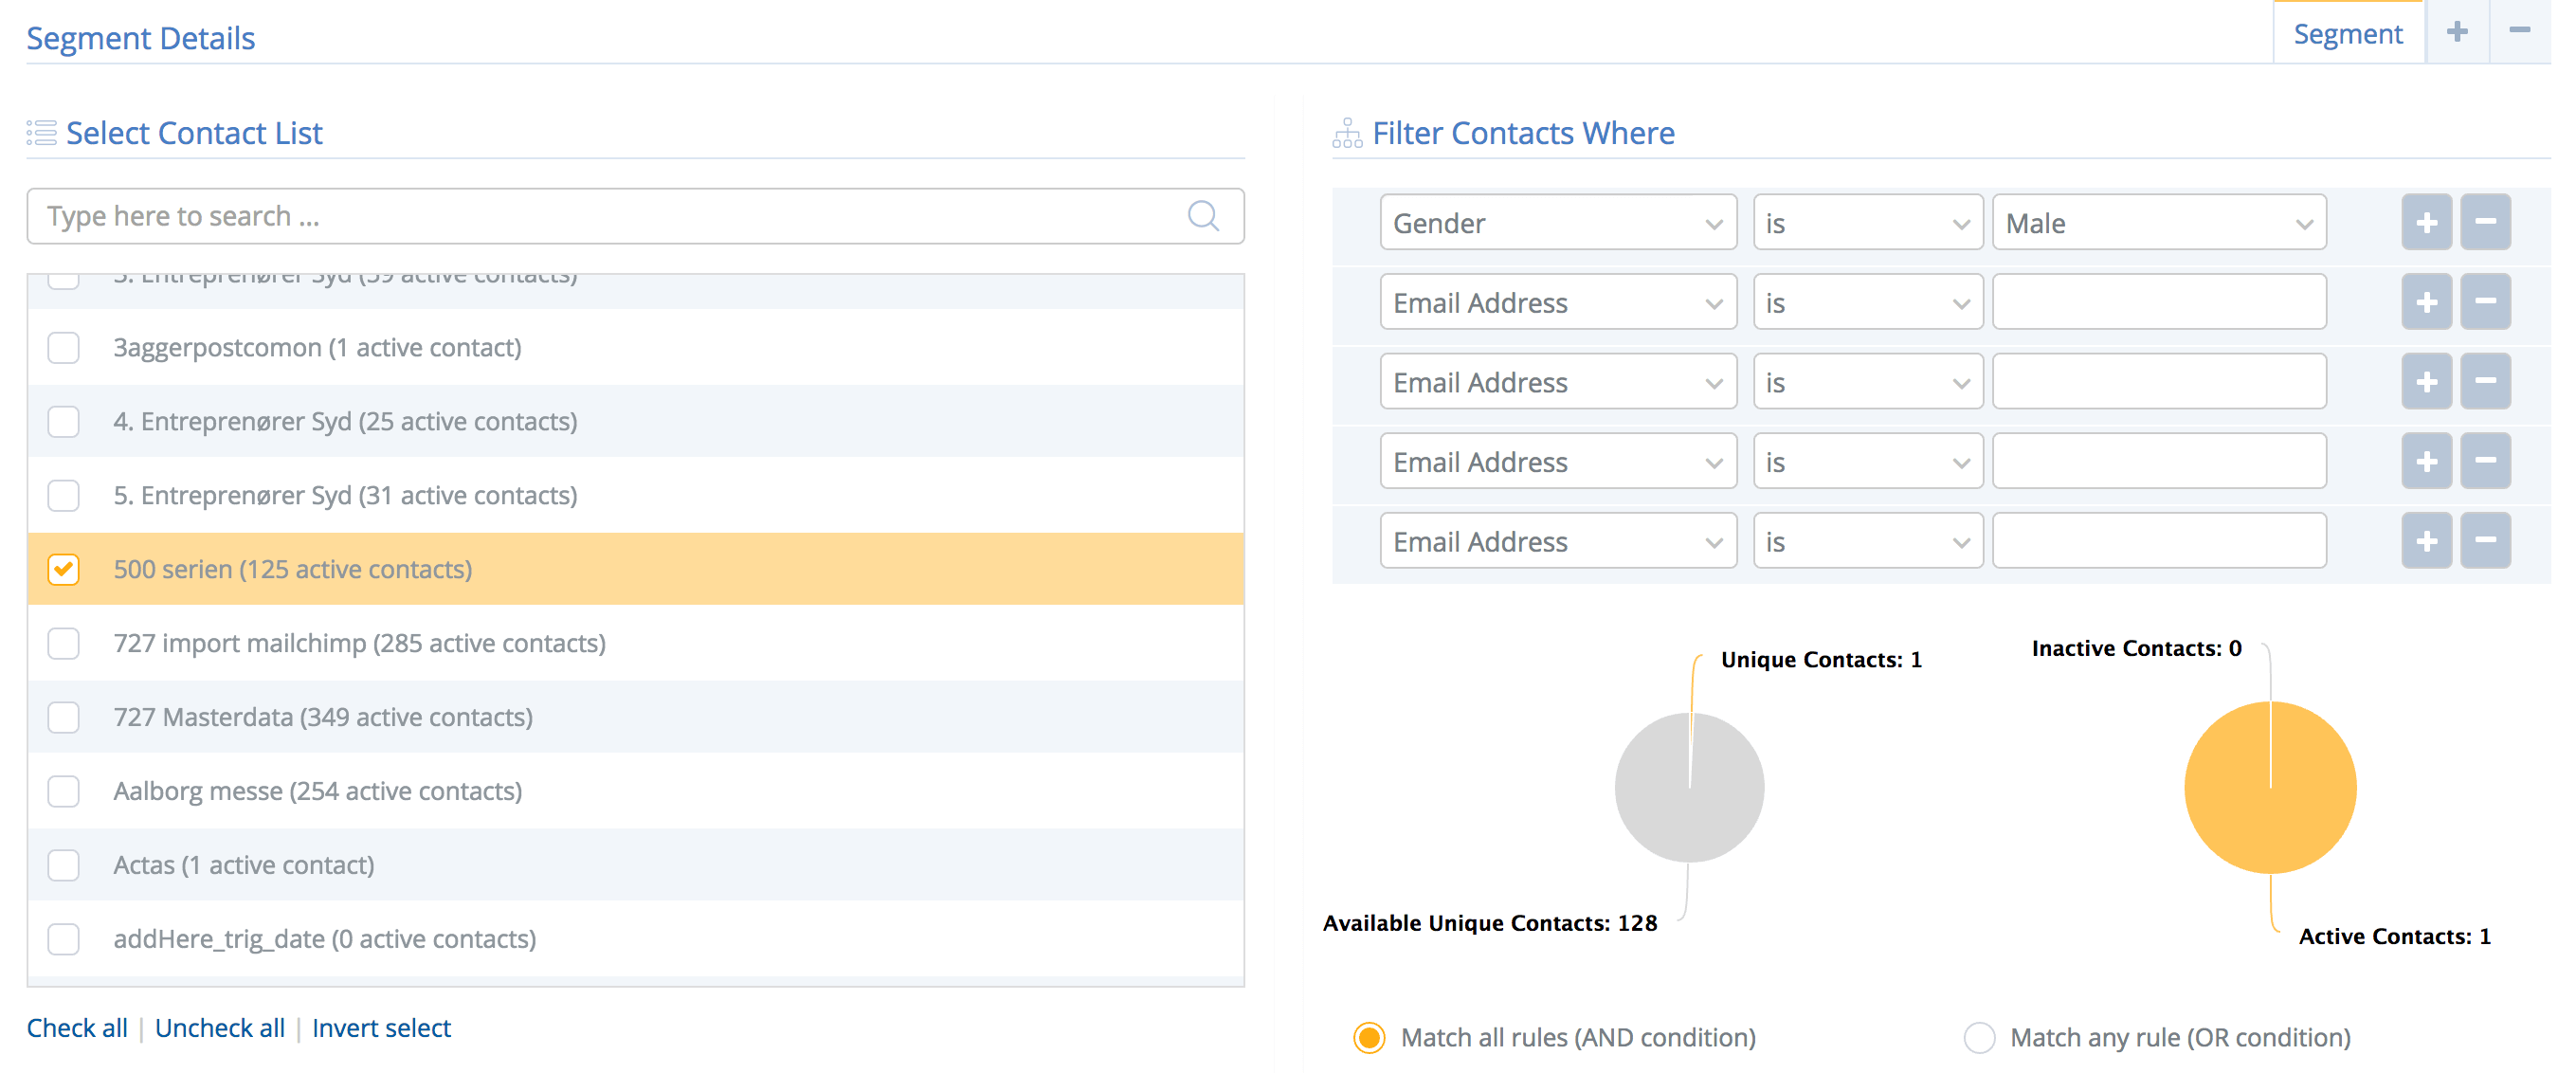 segmenter-mailplatform-vaelgkoen